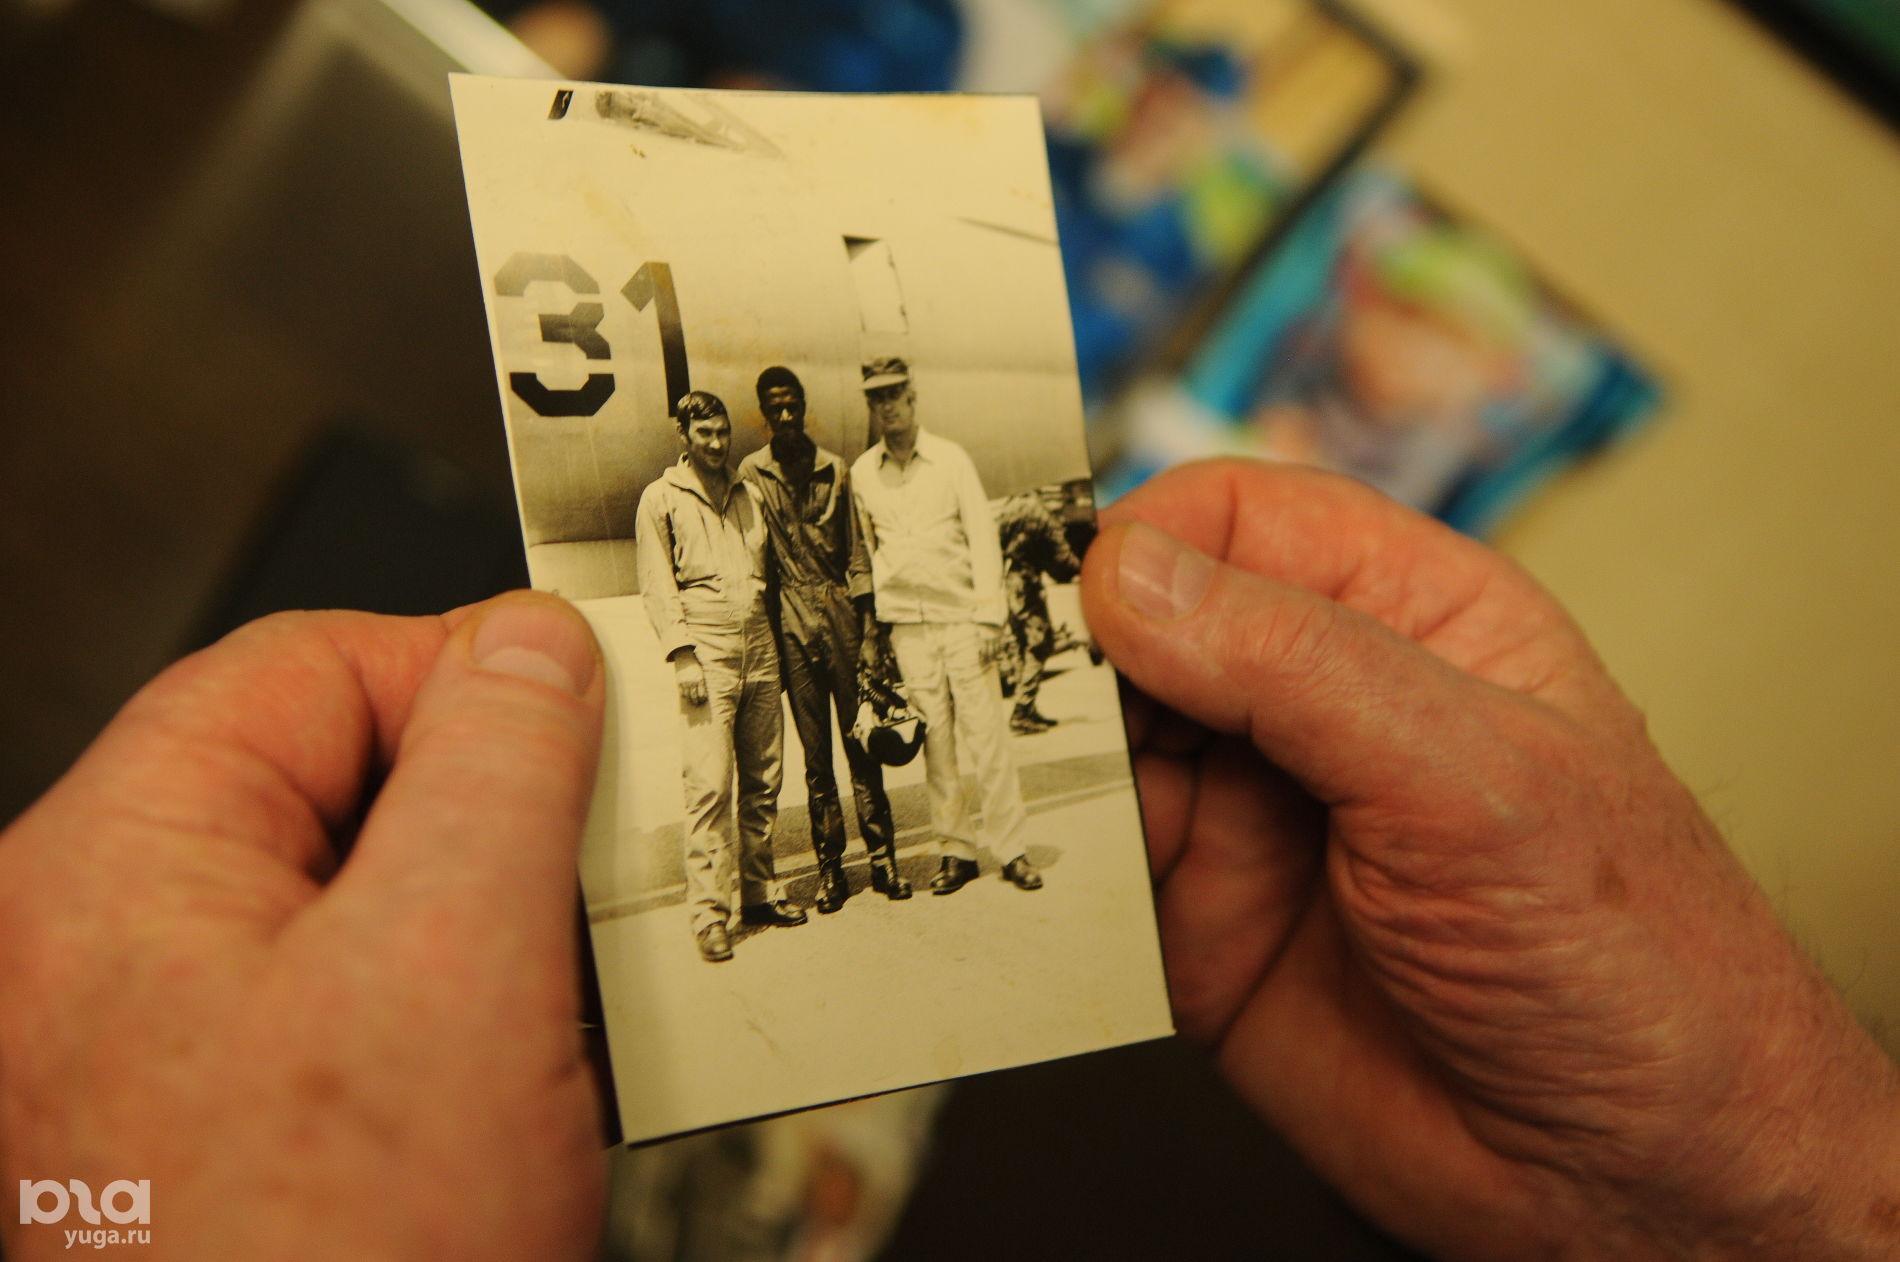 Николай Адонин (справа) с сослуживцами в Анголе ©Фото Юга.ру